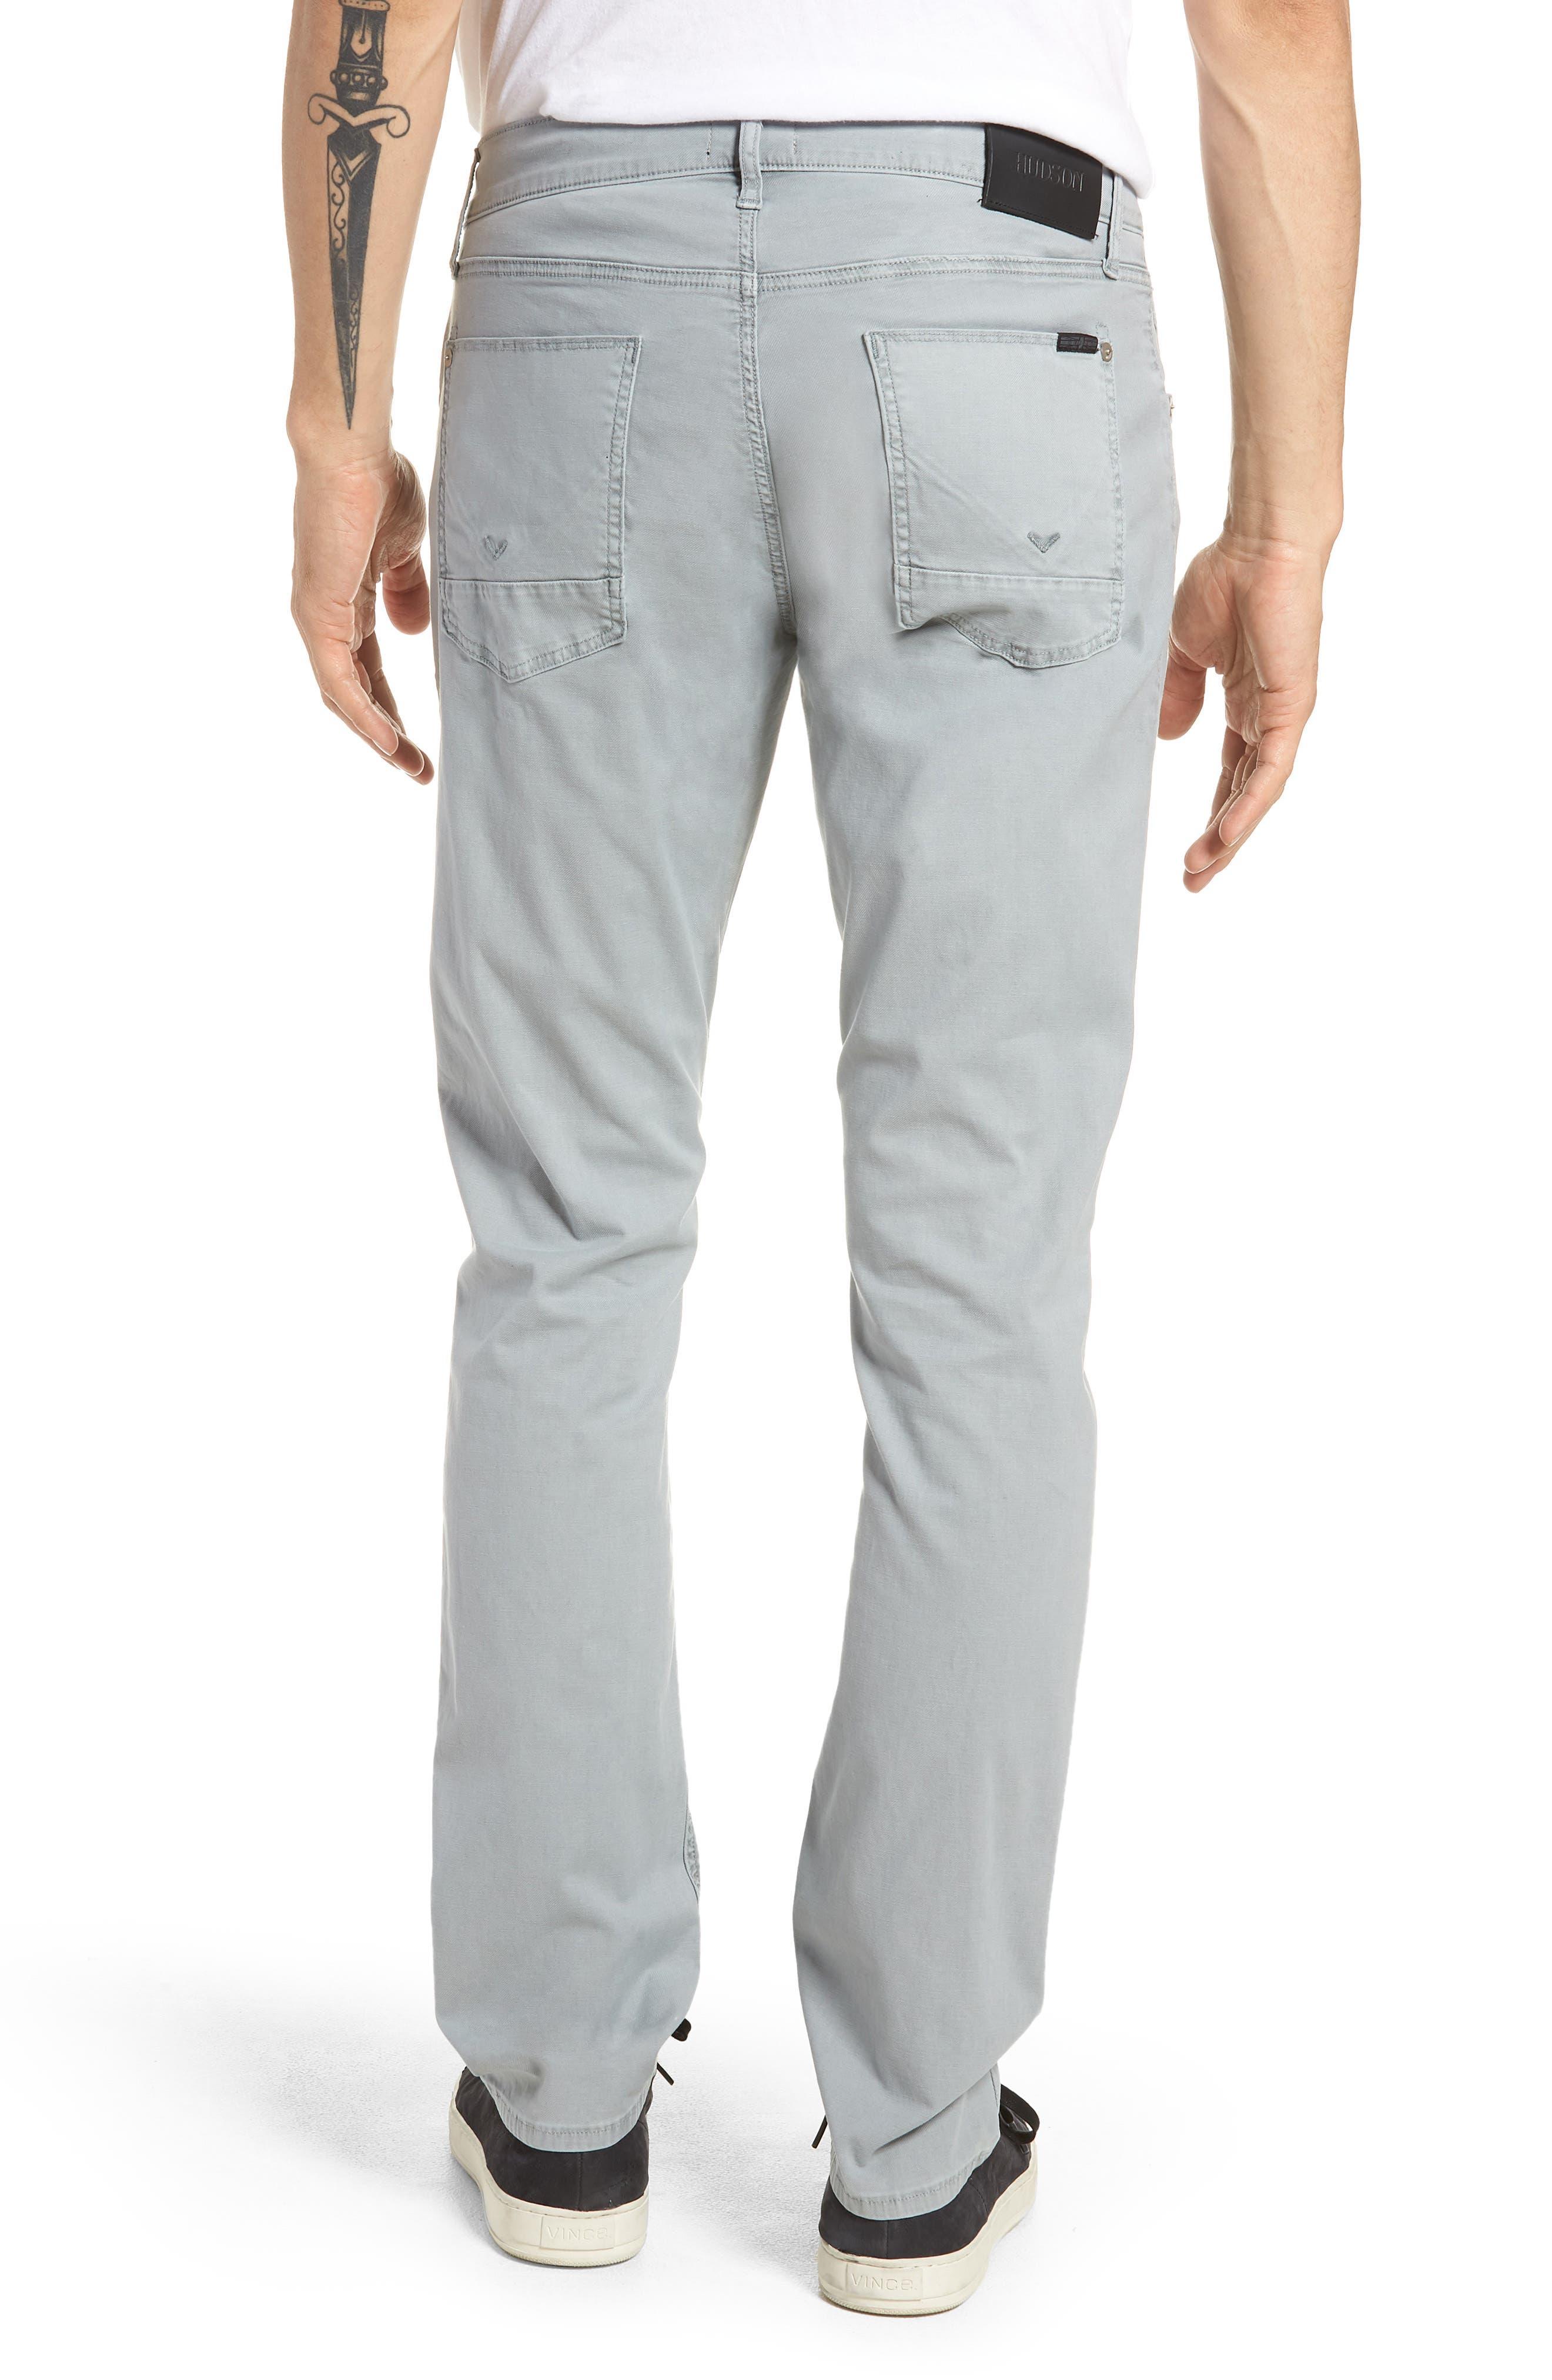 Blake Slim Fit Jeans,                             Alternate thumbnail 2, color,                             Steel Blue